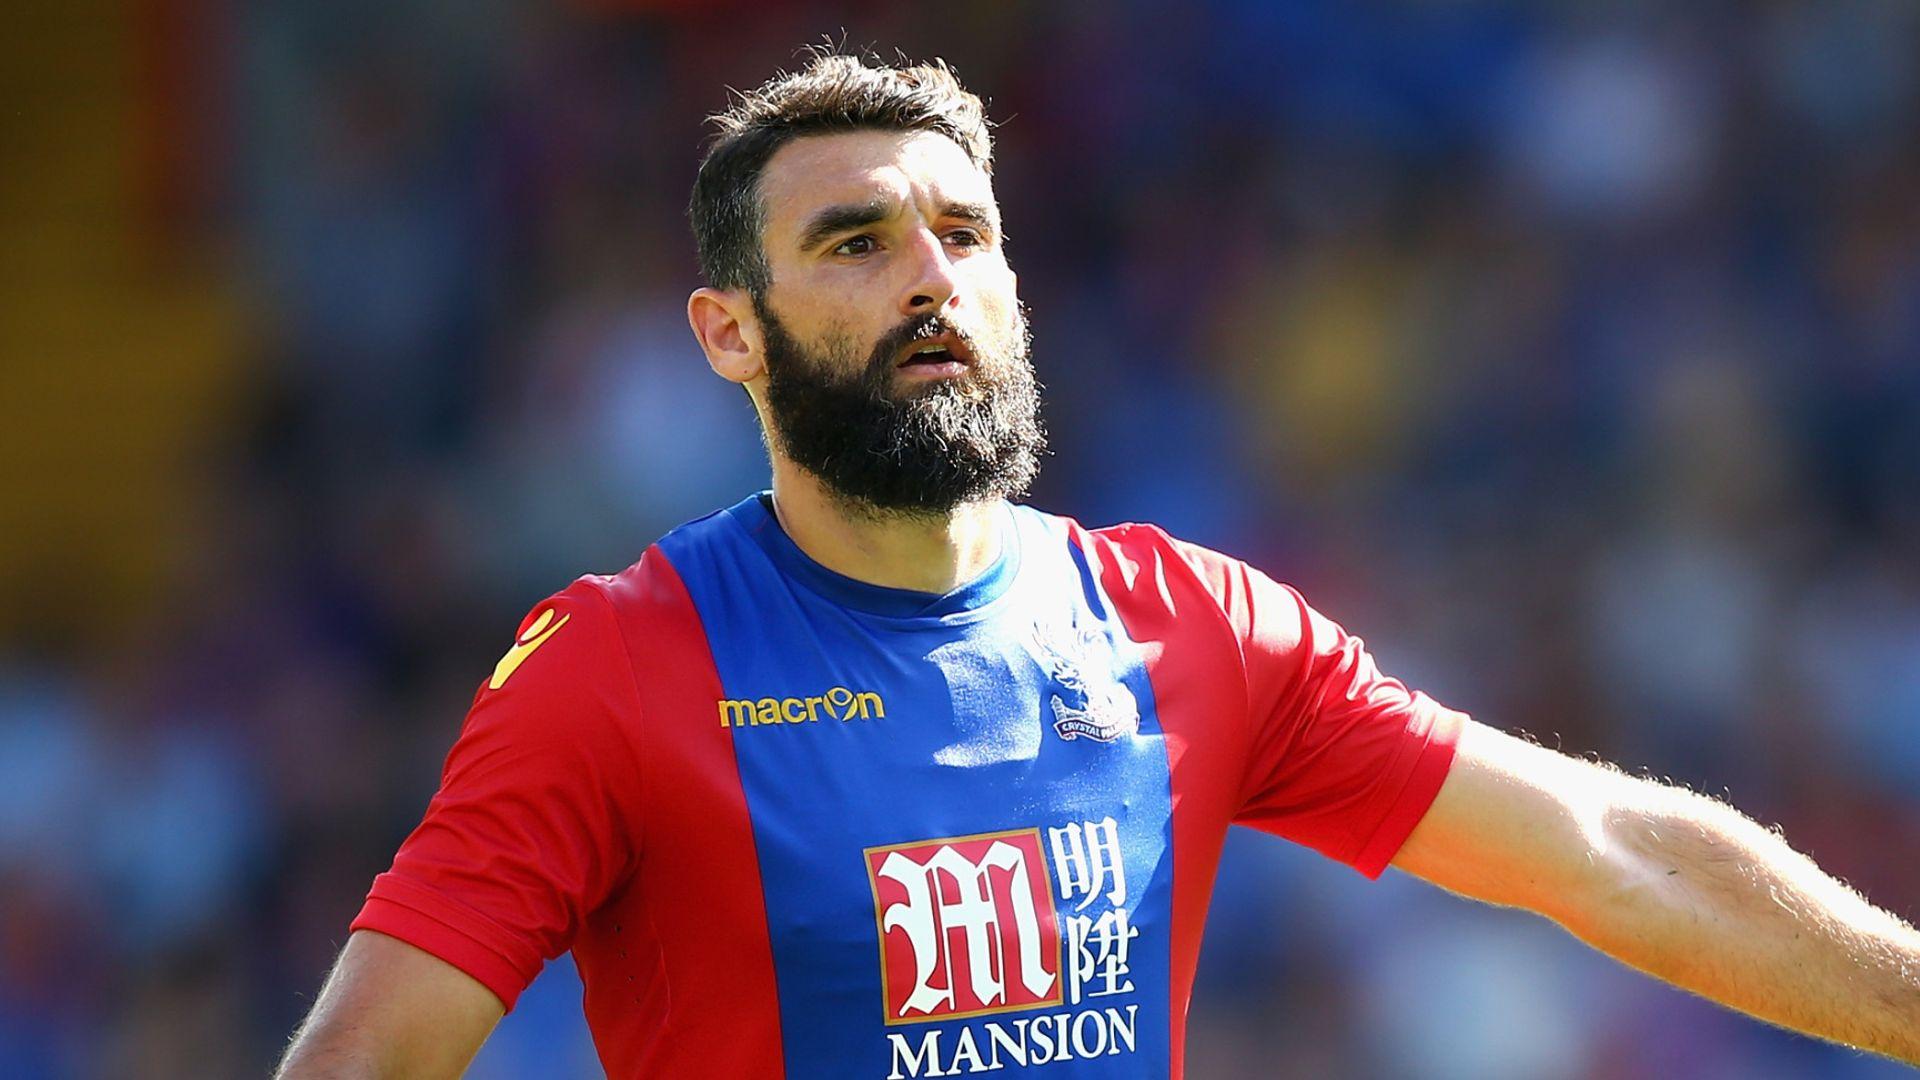 Former Palace captain Jedinak retires